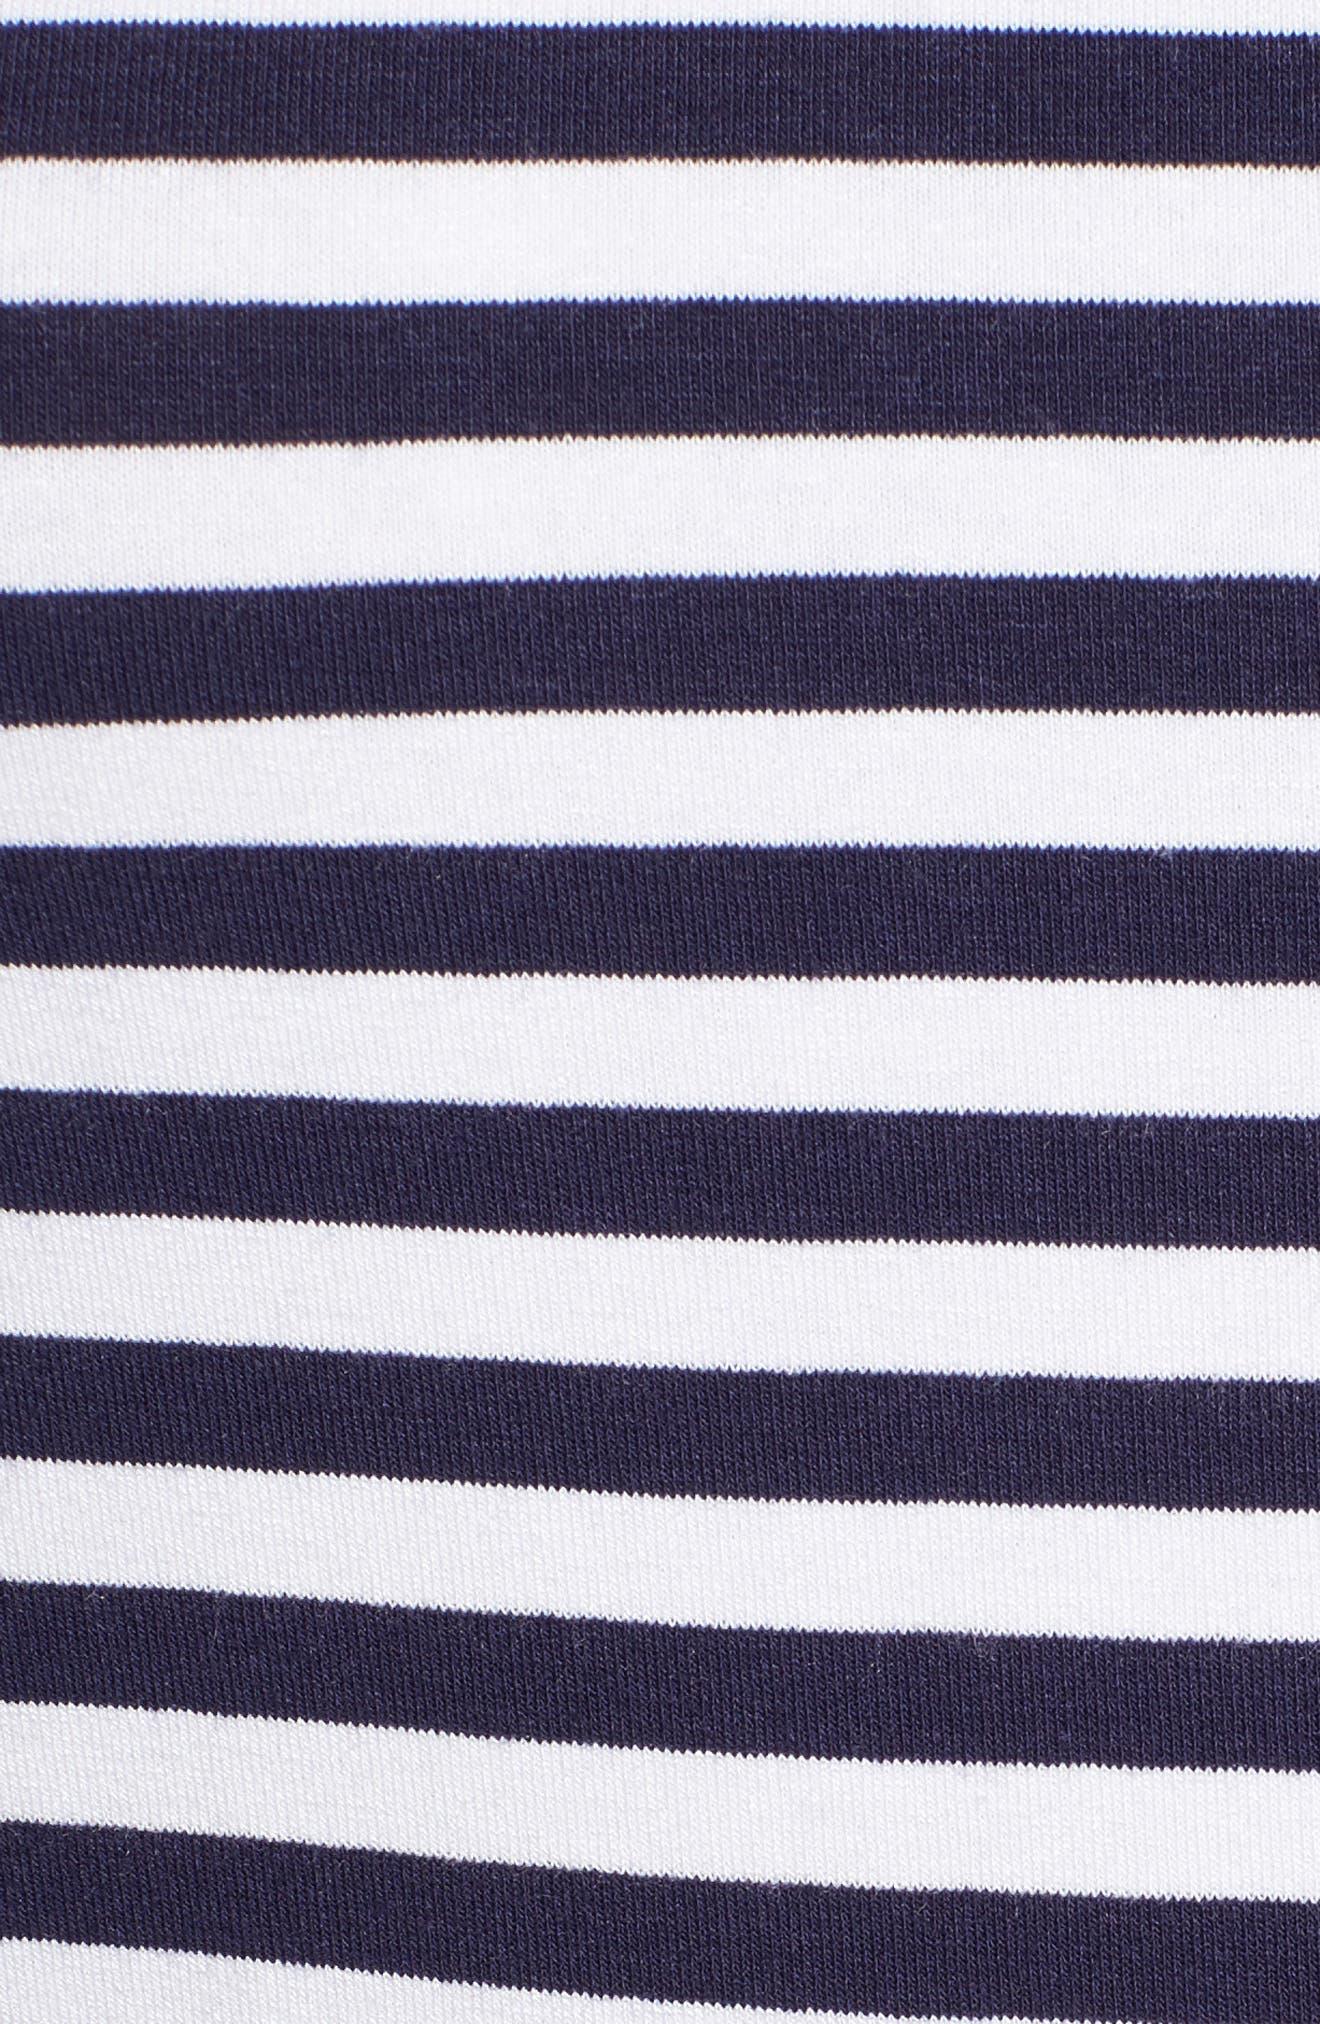 Stripe Long Sleeve Tee,                             Alternate thumbnail 5, color,                             Navy- Ivory Even Stripe